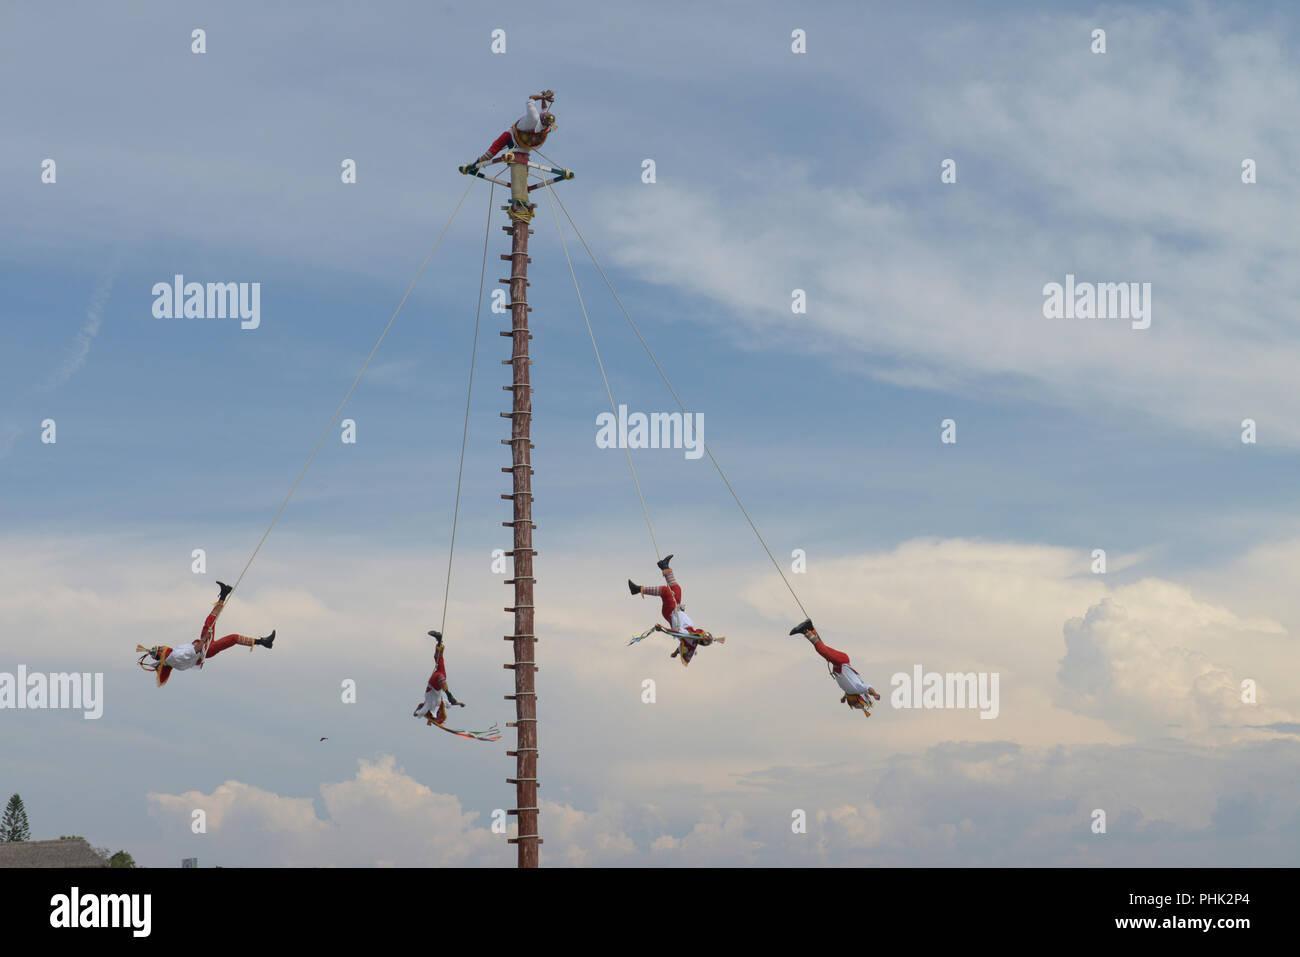 Voladores de papantla or PAPANTLA FLYERS - Stock Image